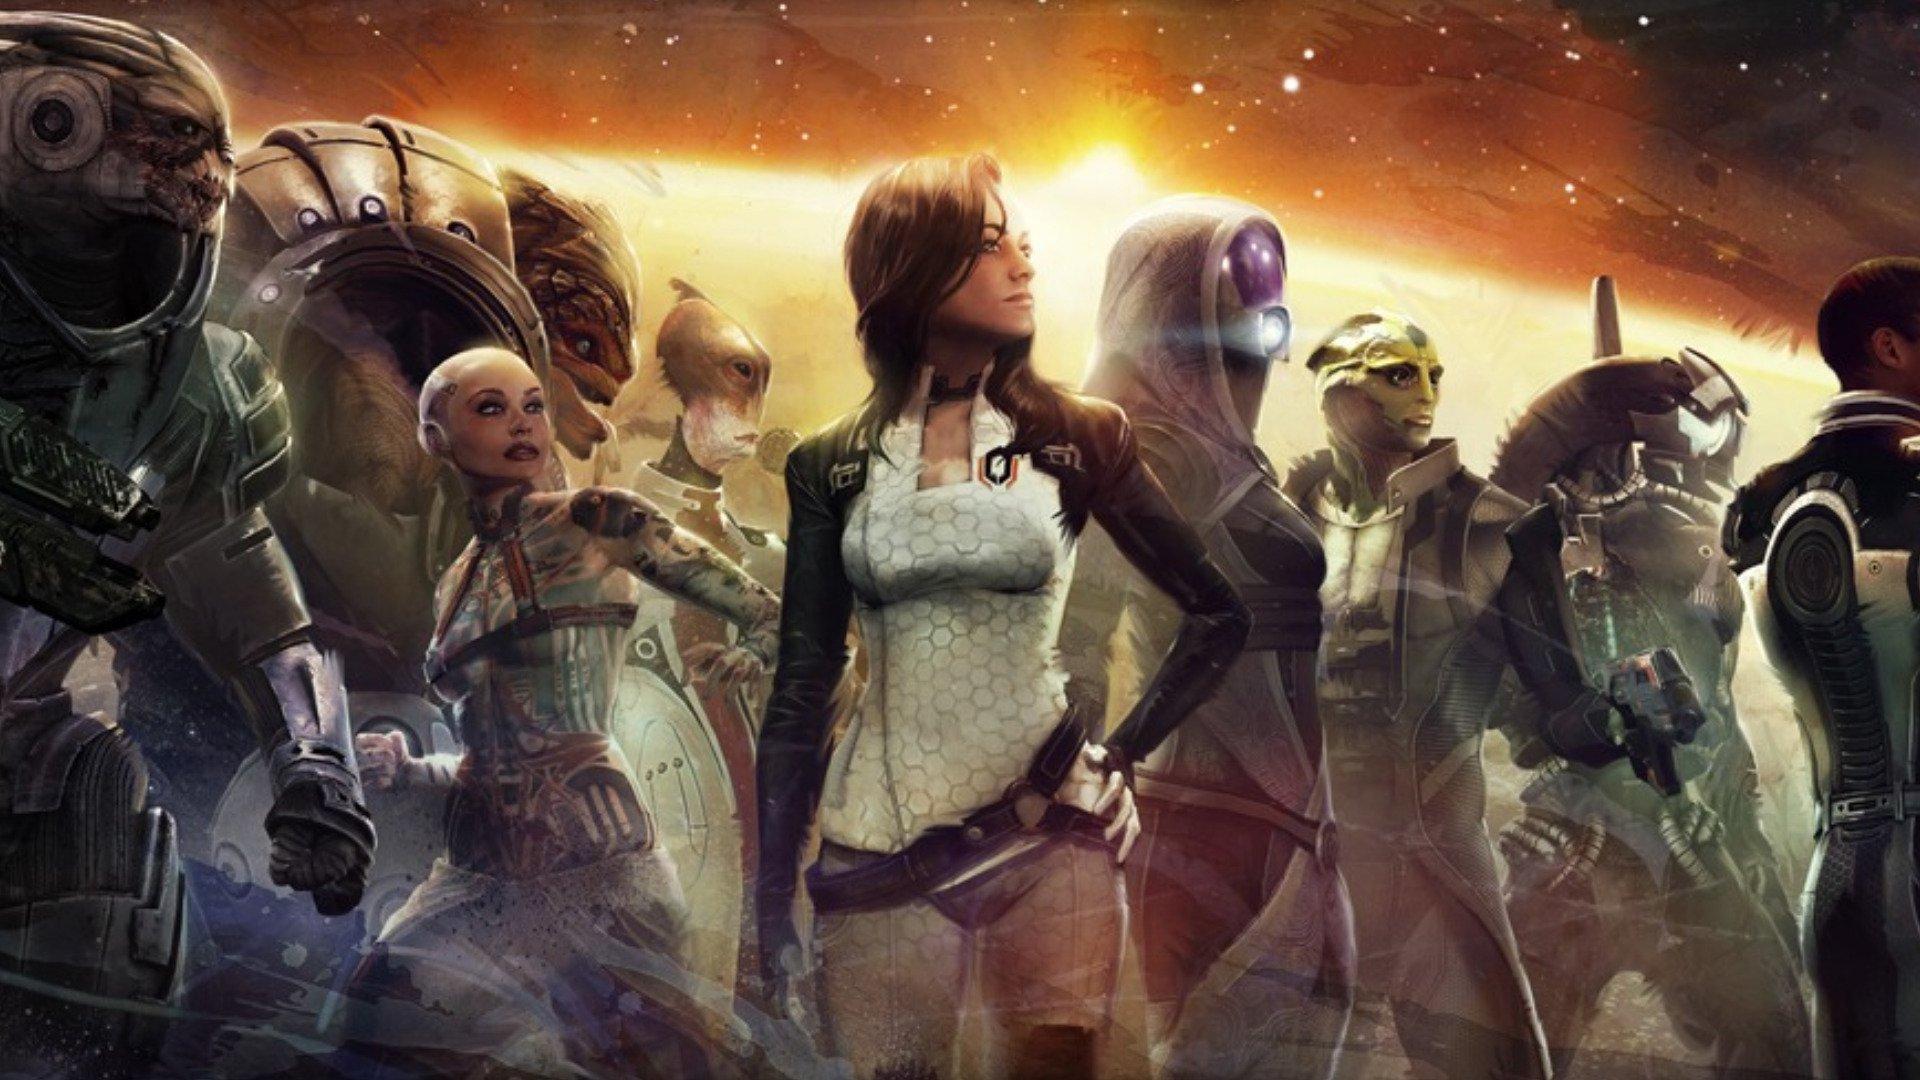 36 Legion (Mass Effect) HD Wallpapers | Backgrounds - Wallpaper Abyss